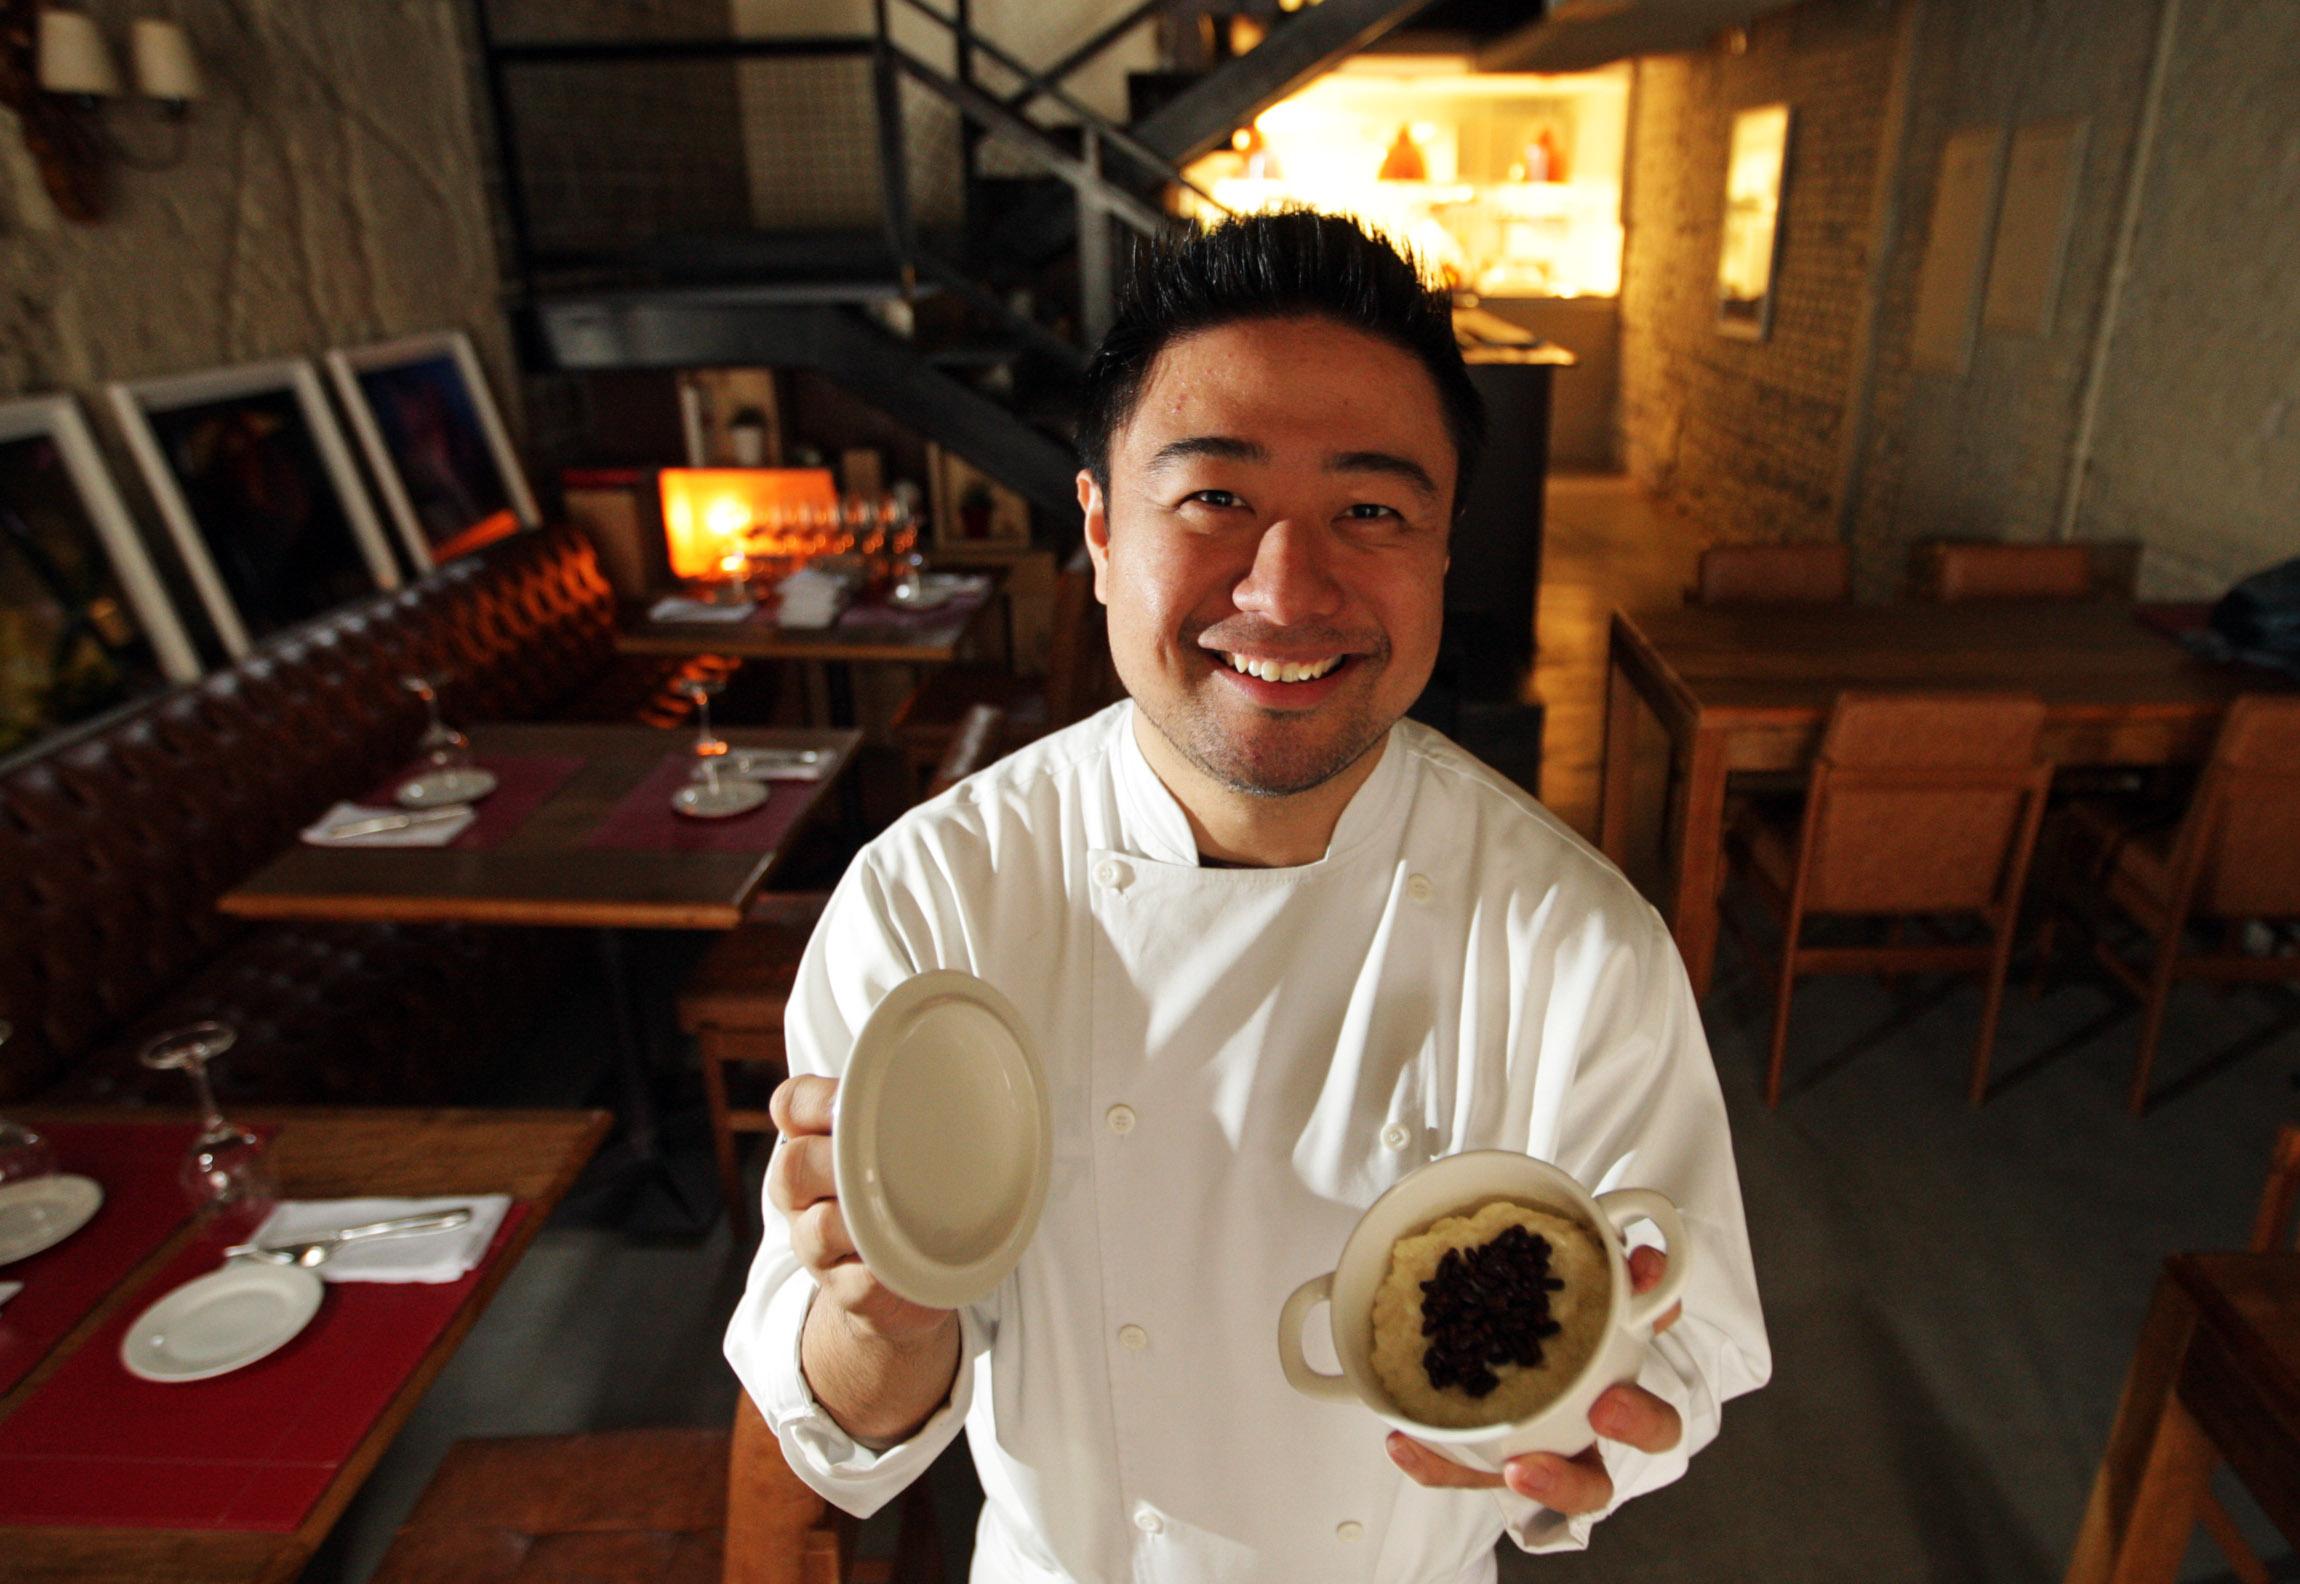 Fotos internas do restaurante MIYA , da sobremesa arroz doce re do chef Falvio Miyamura .